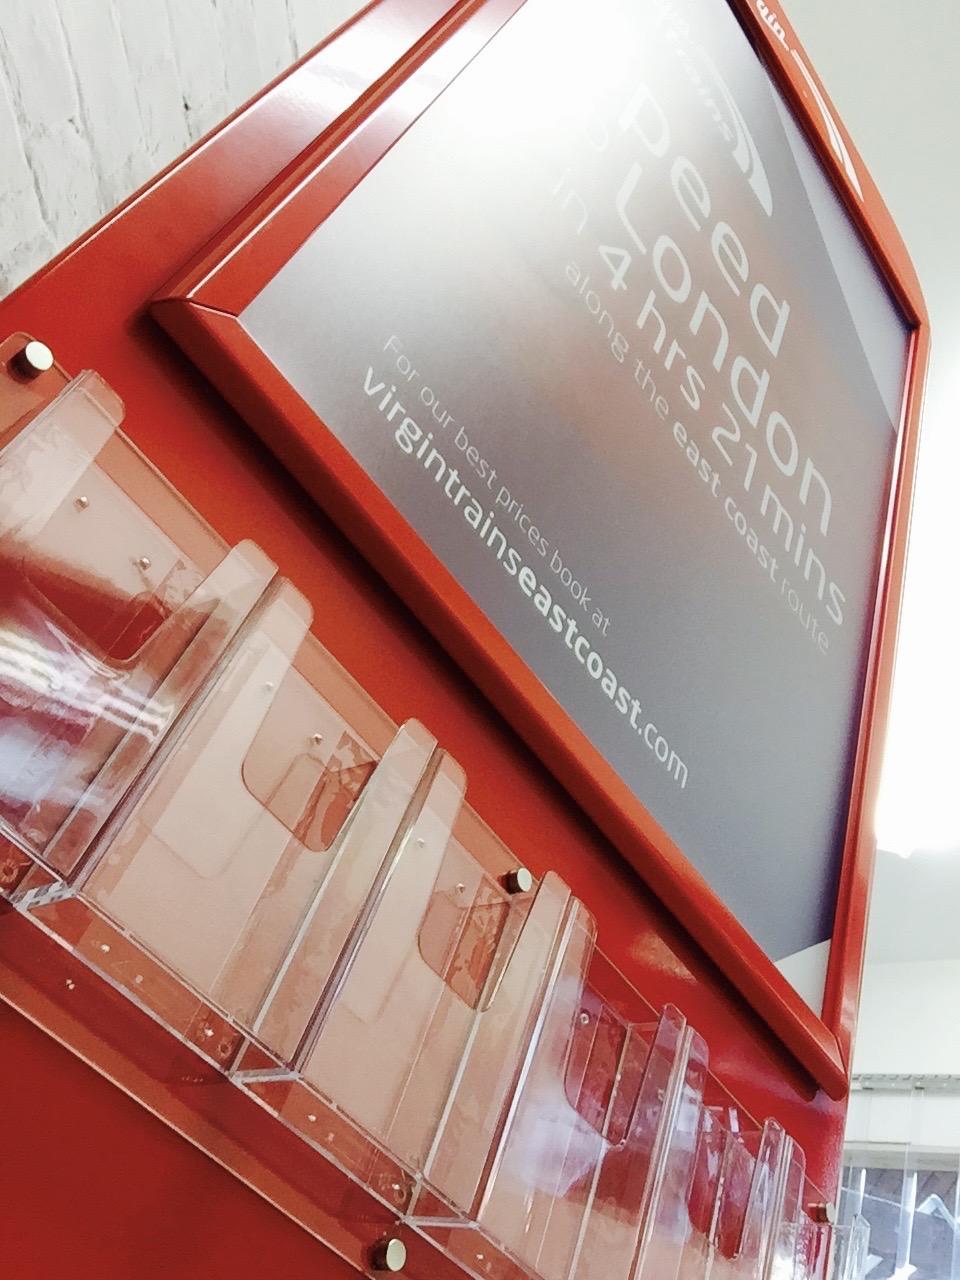 Virgin Trains mobile display 4